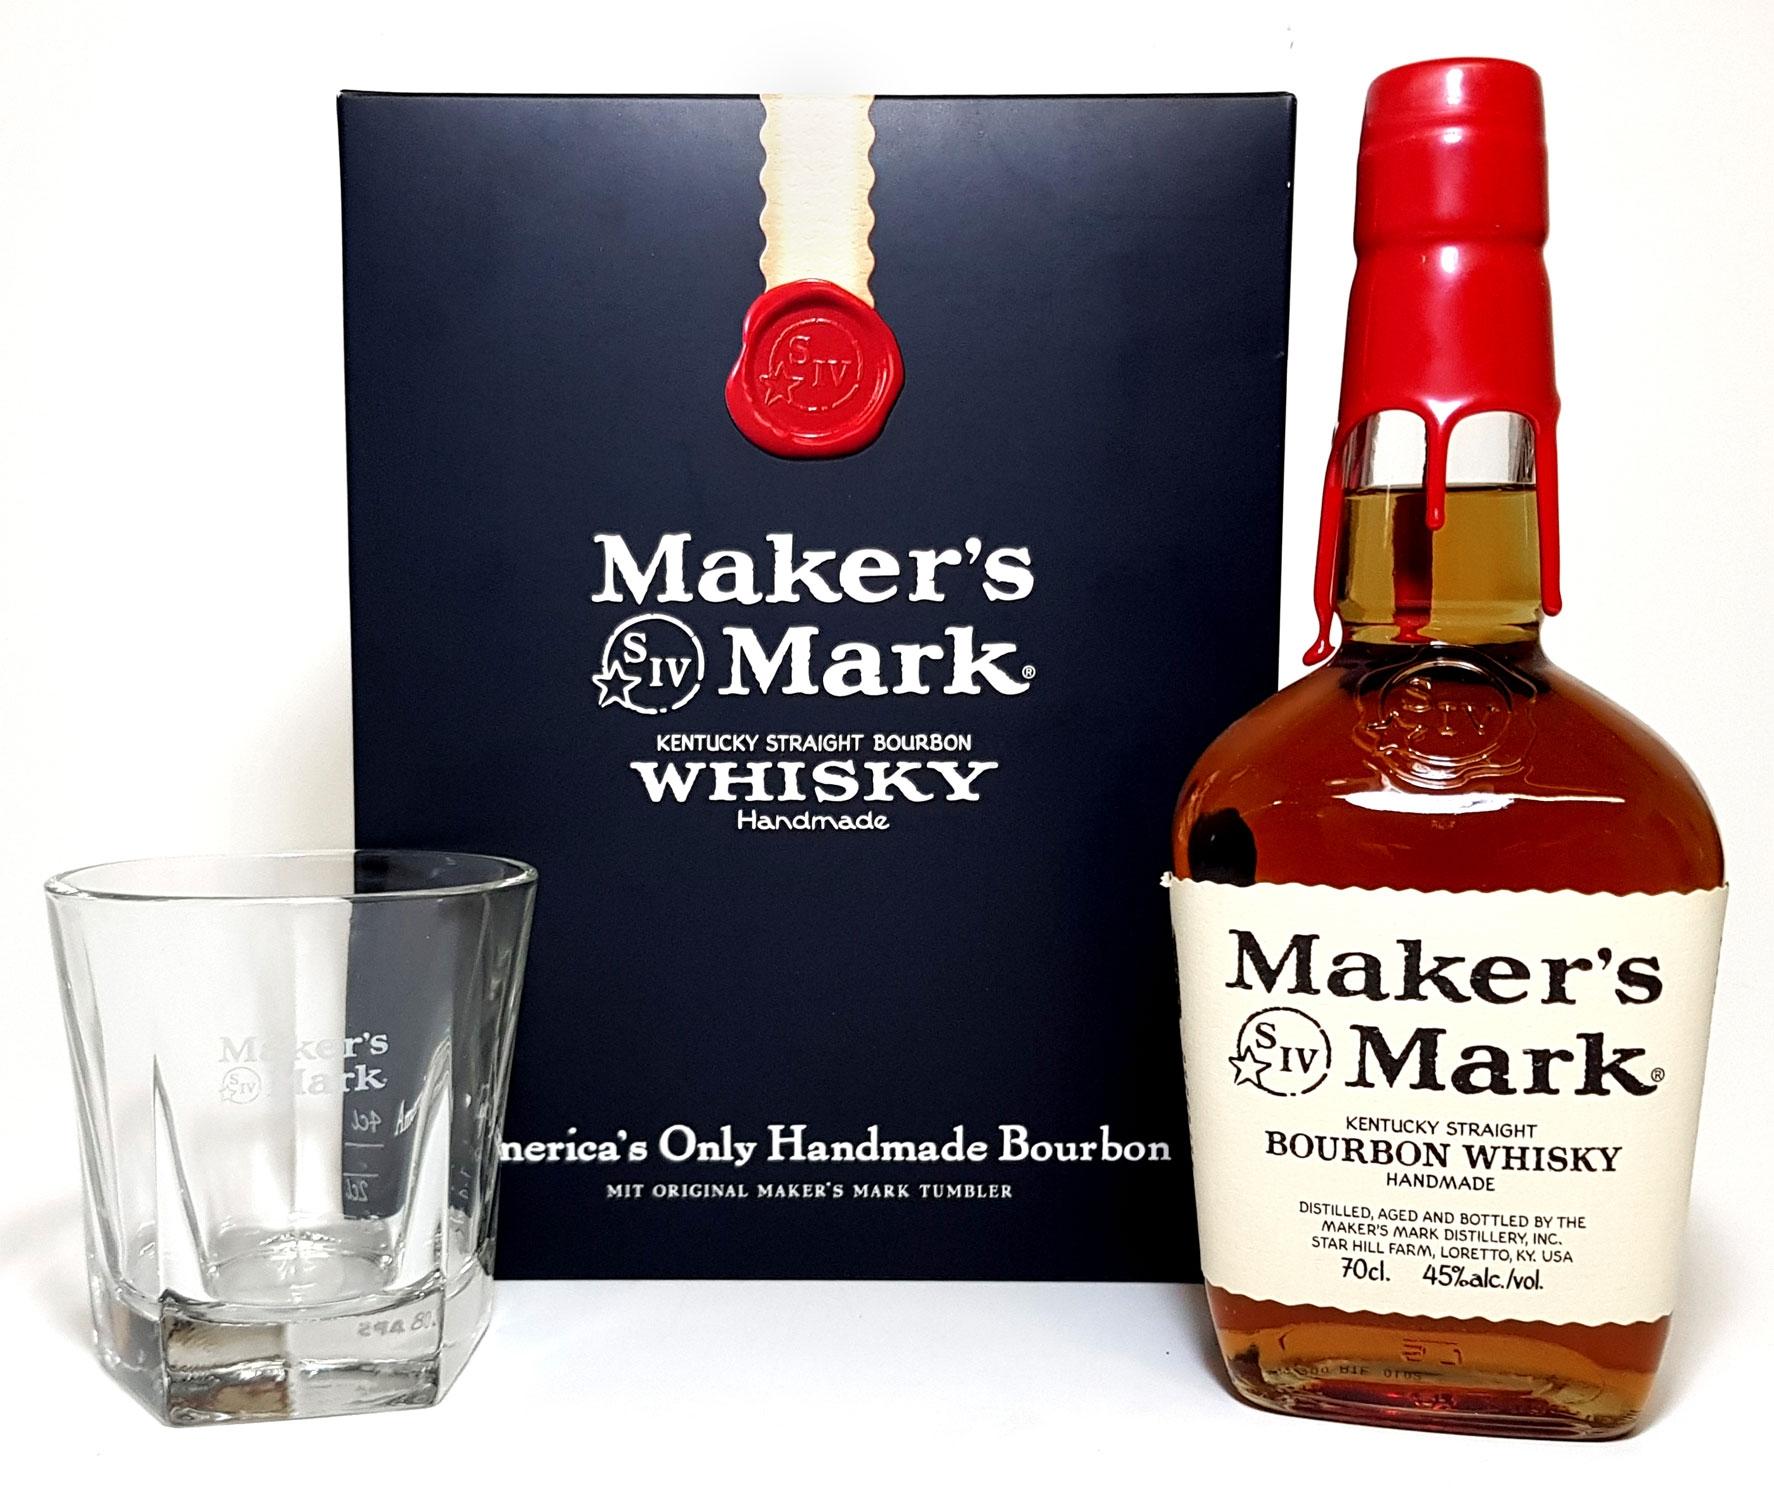 Makers Mark Set - Makers Mark Bourbon Whisky 0,7l 700ml (45% Vol) + Tumbler geeicht 2/4cl